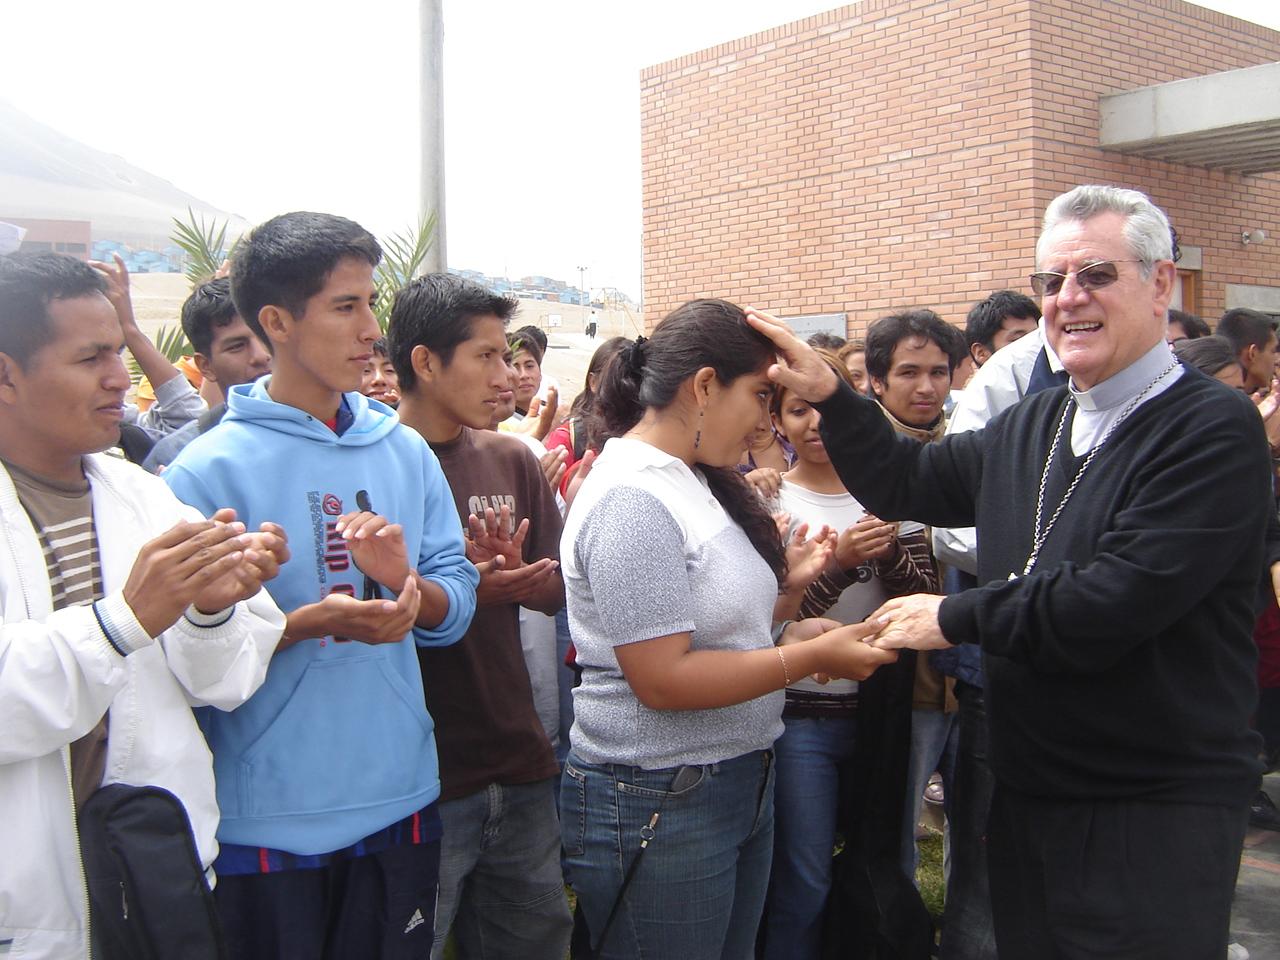 Mons. Irízar Campos bendice a unos jóvenes © Esther Núñez Balbín